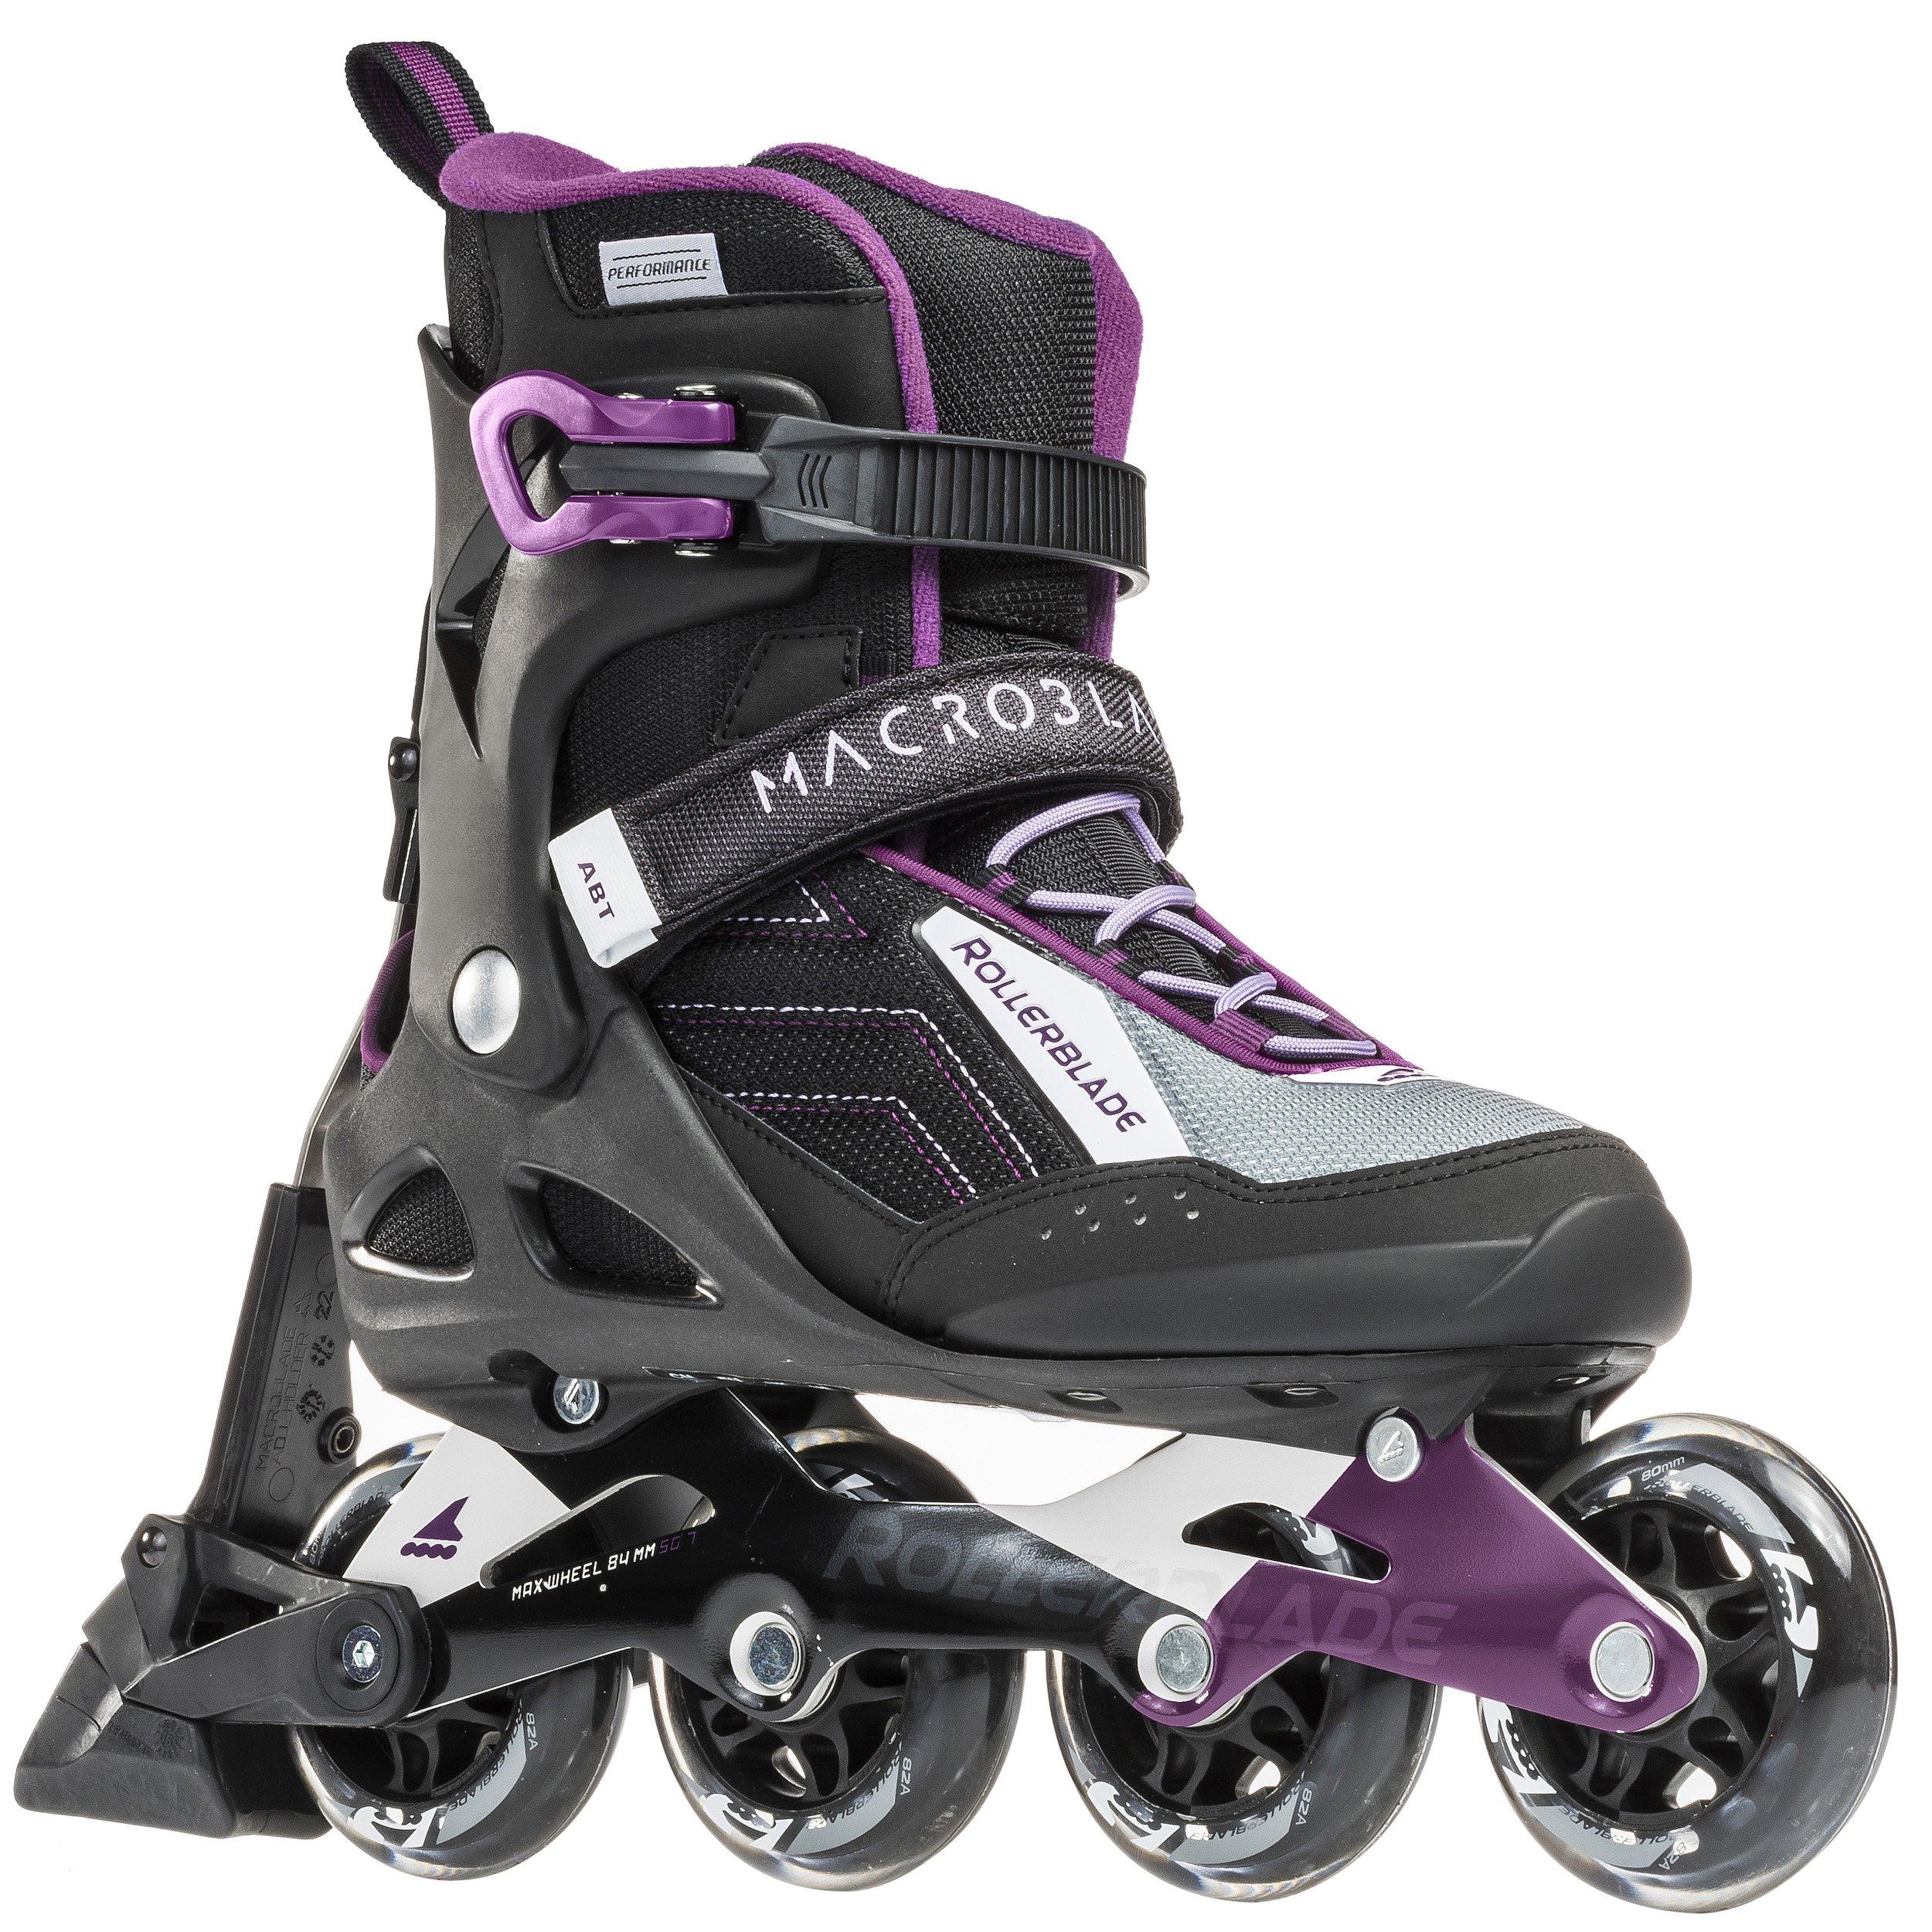 Rollerblade Macroblade W 80 ABT Specific Fit SG7 Bearings Inline Skates, Black/Purple, US Women's 9 by Rollerblade